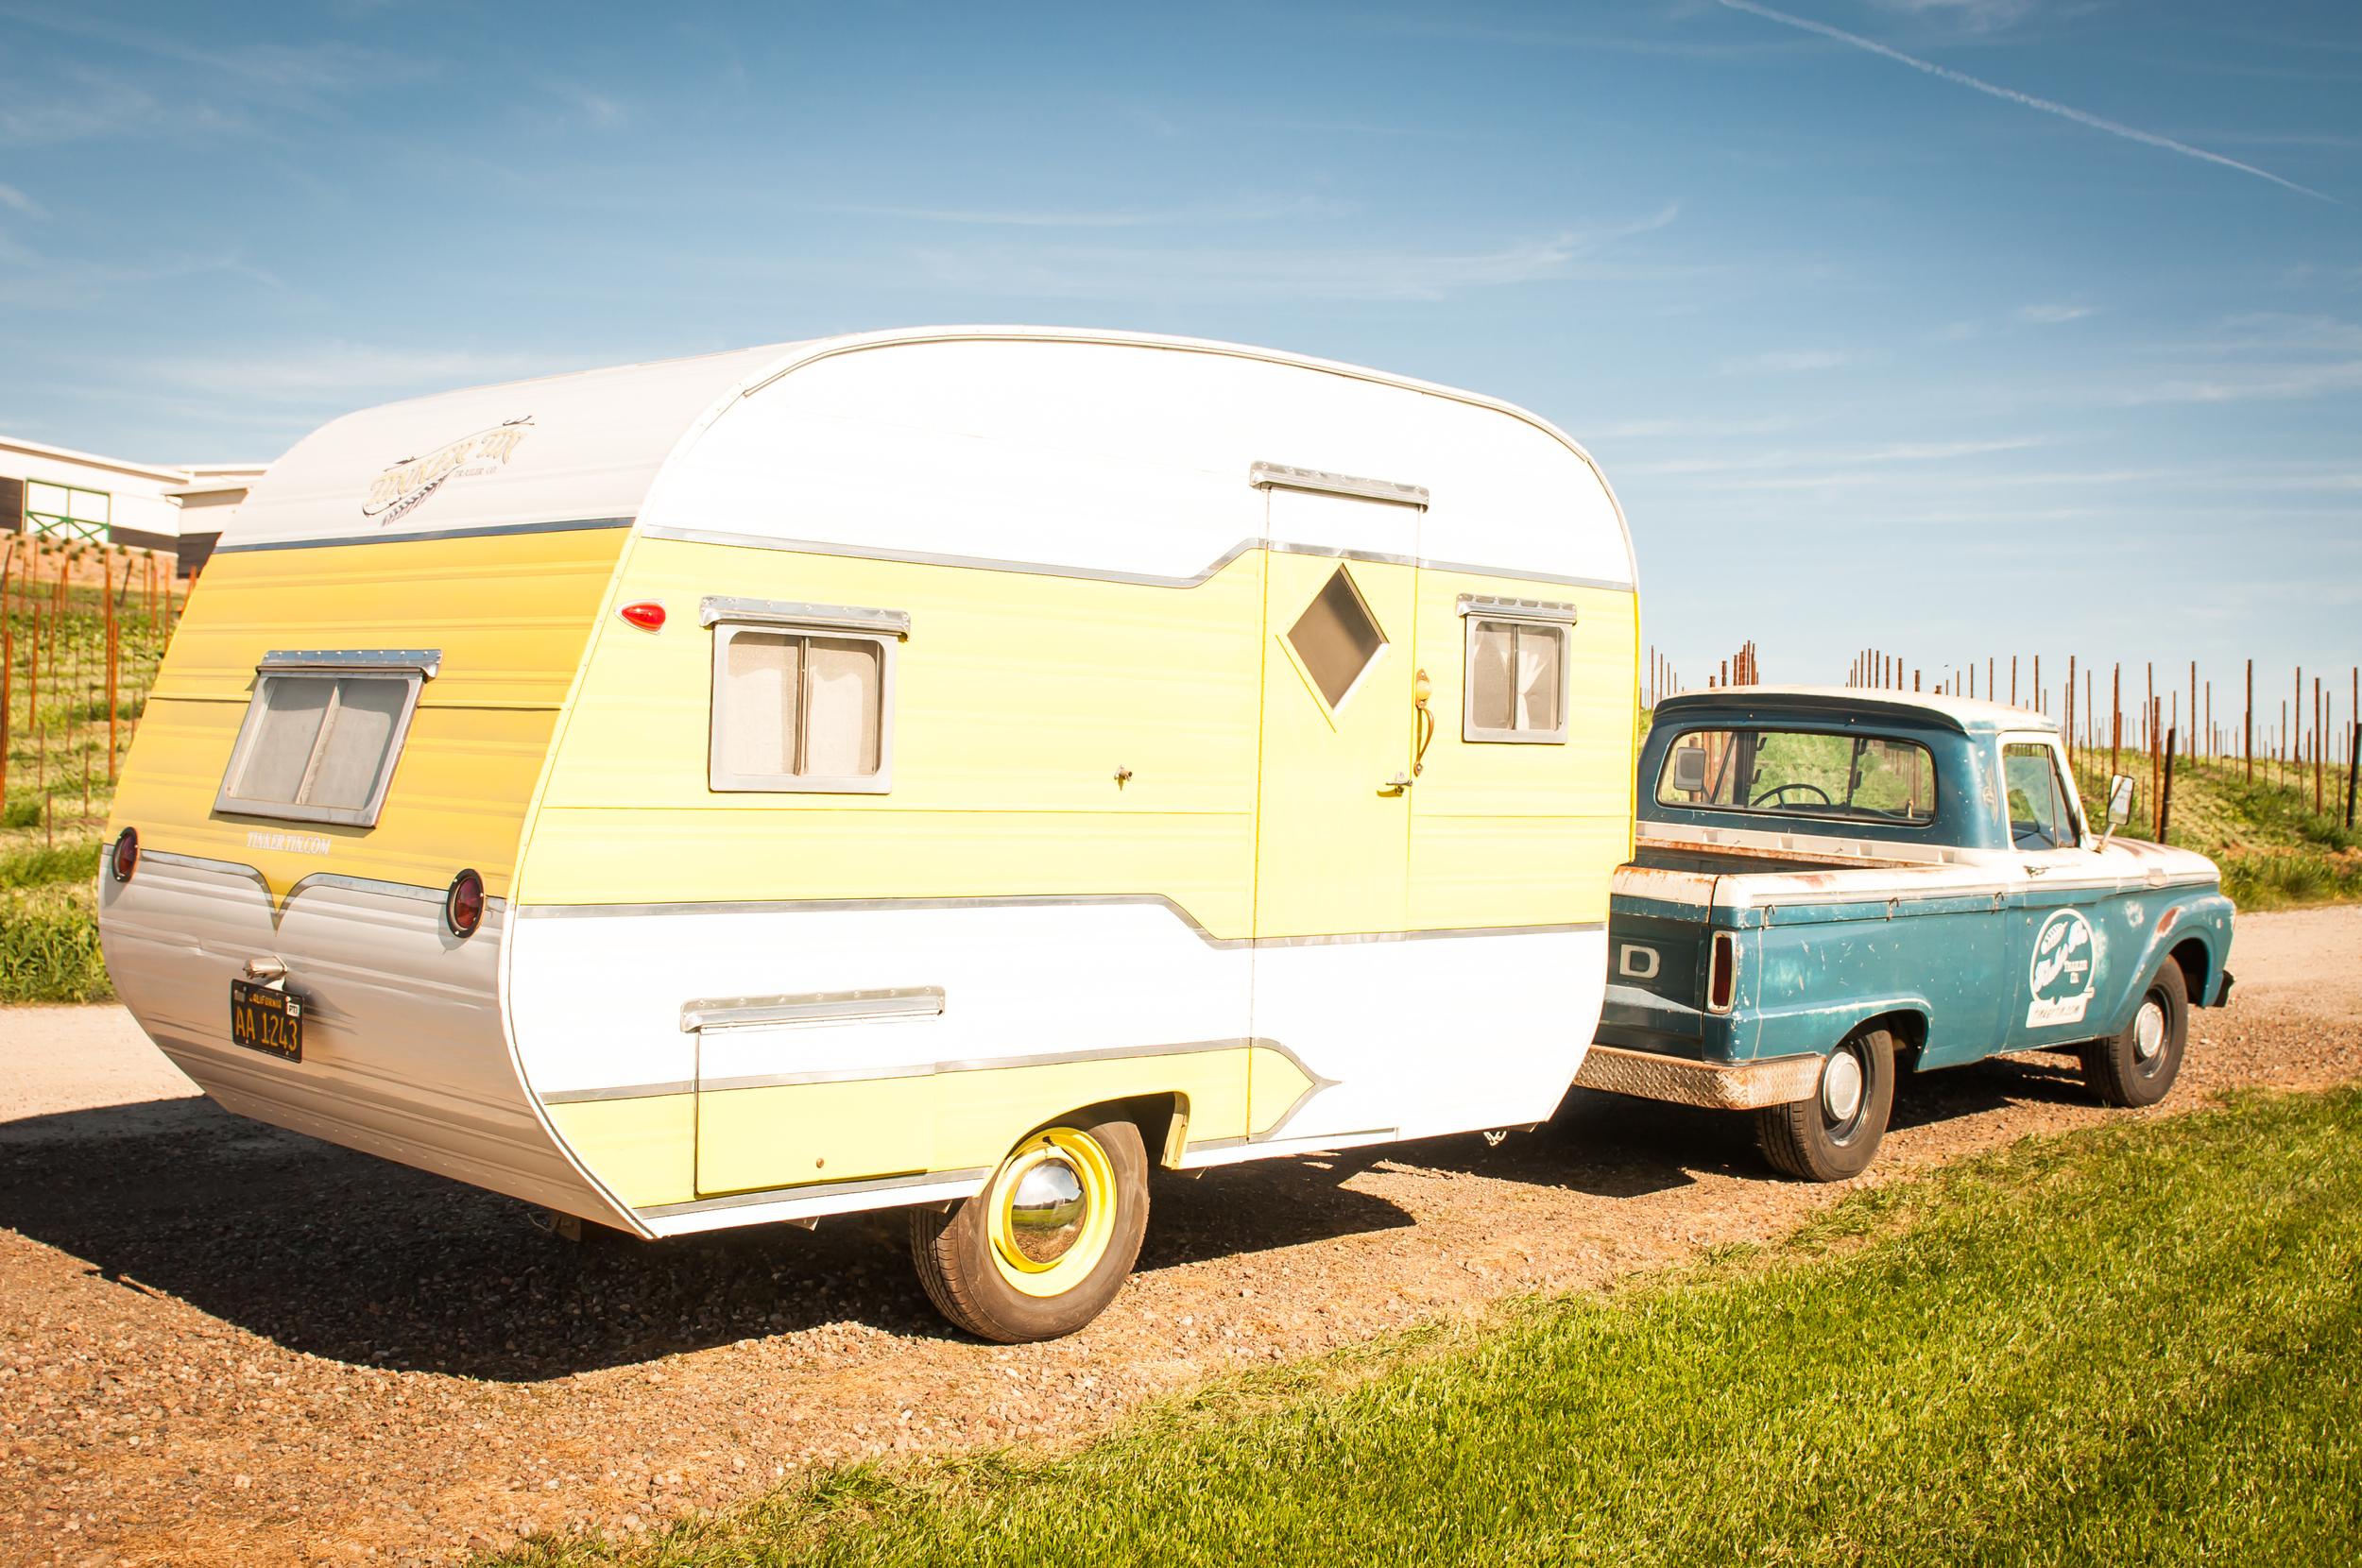 tinker-tin-trailer-co-1956-jewel-1